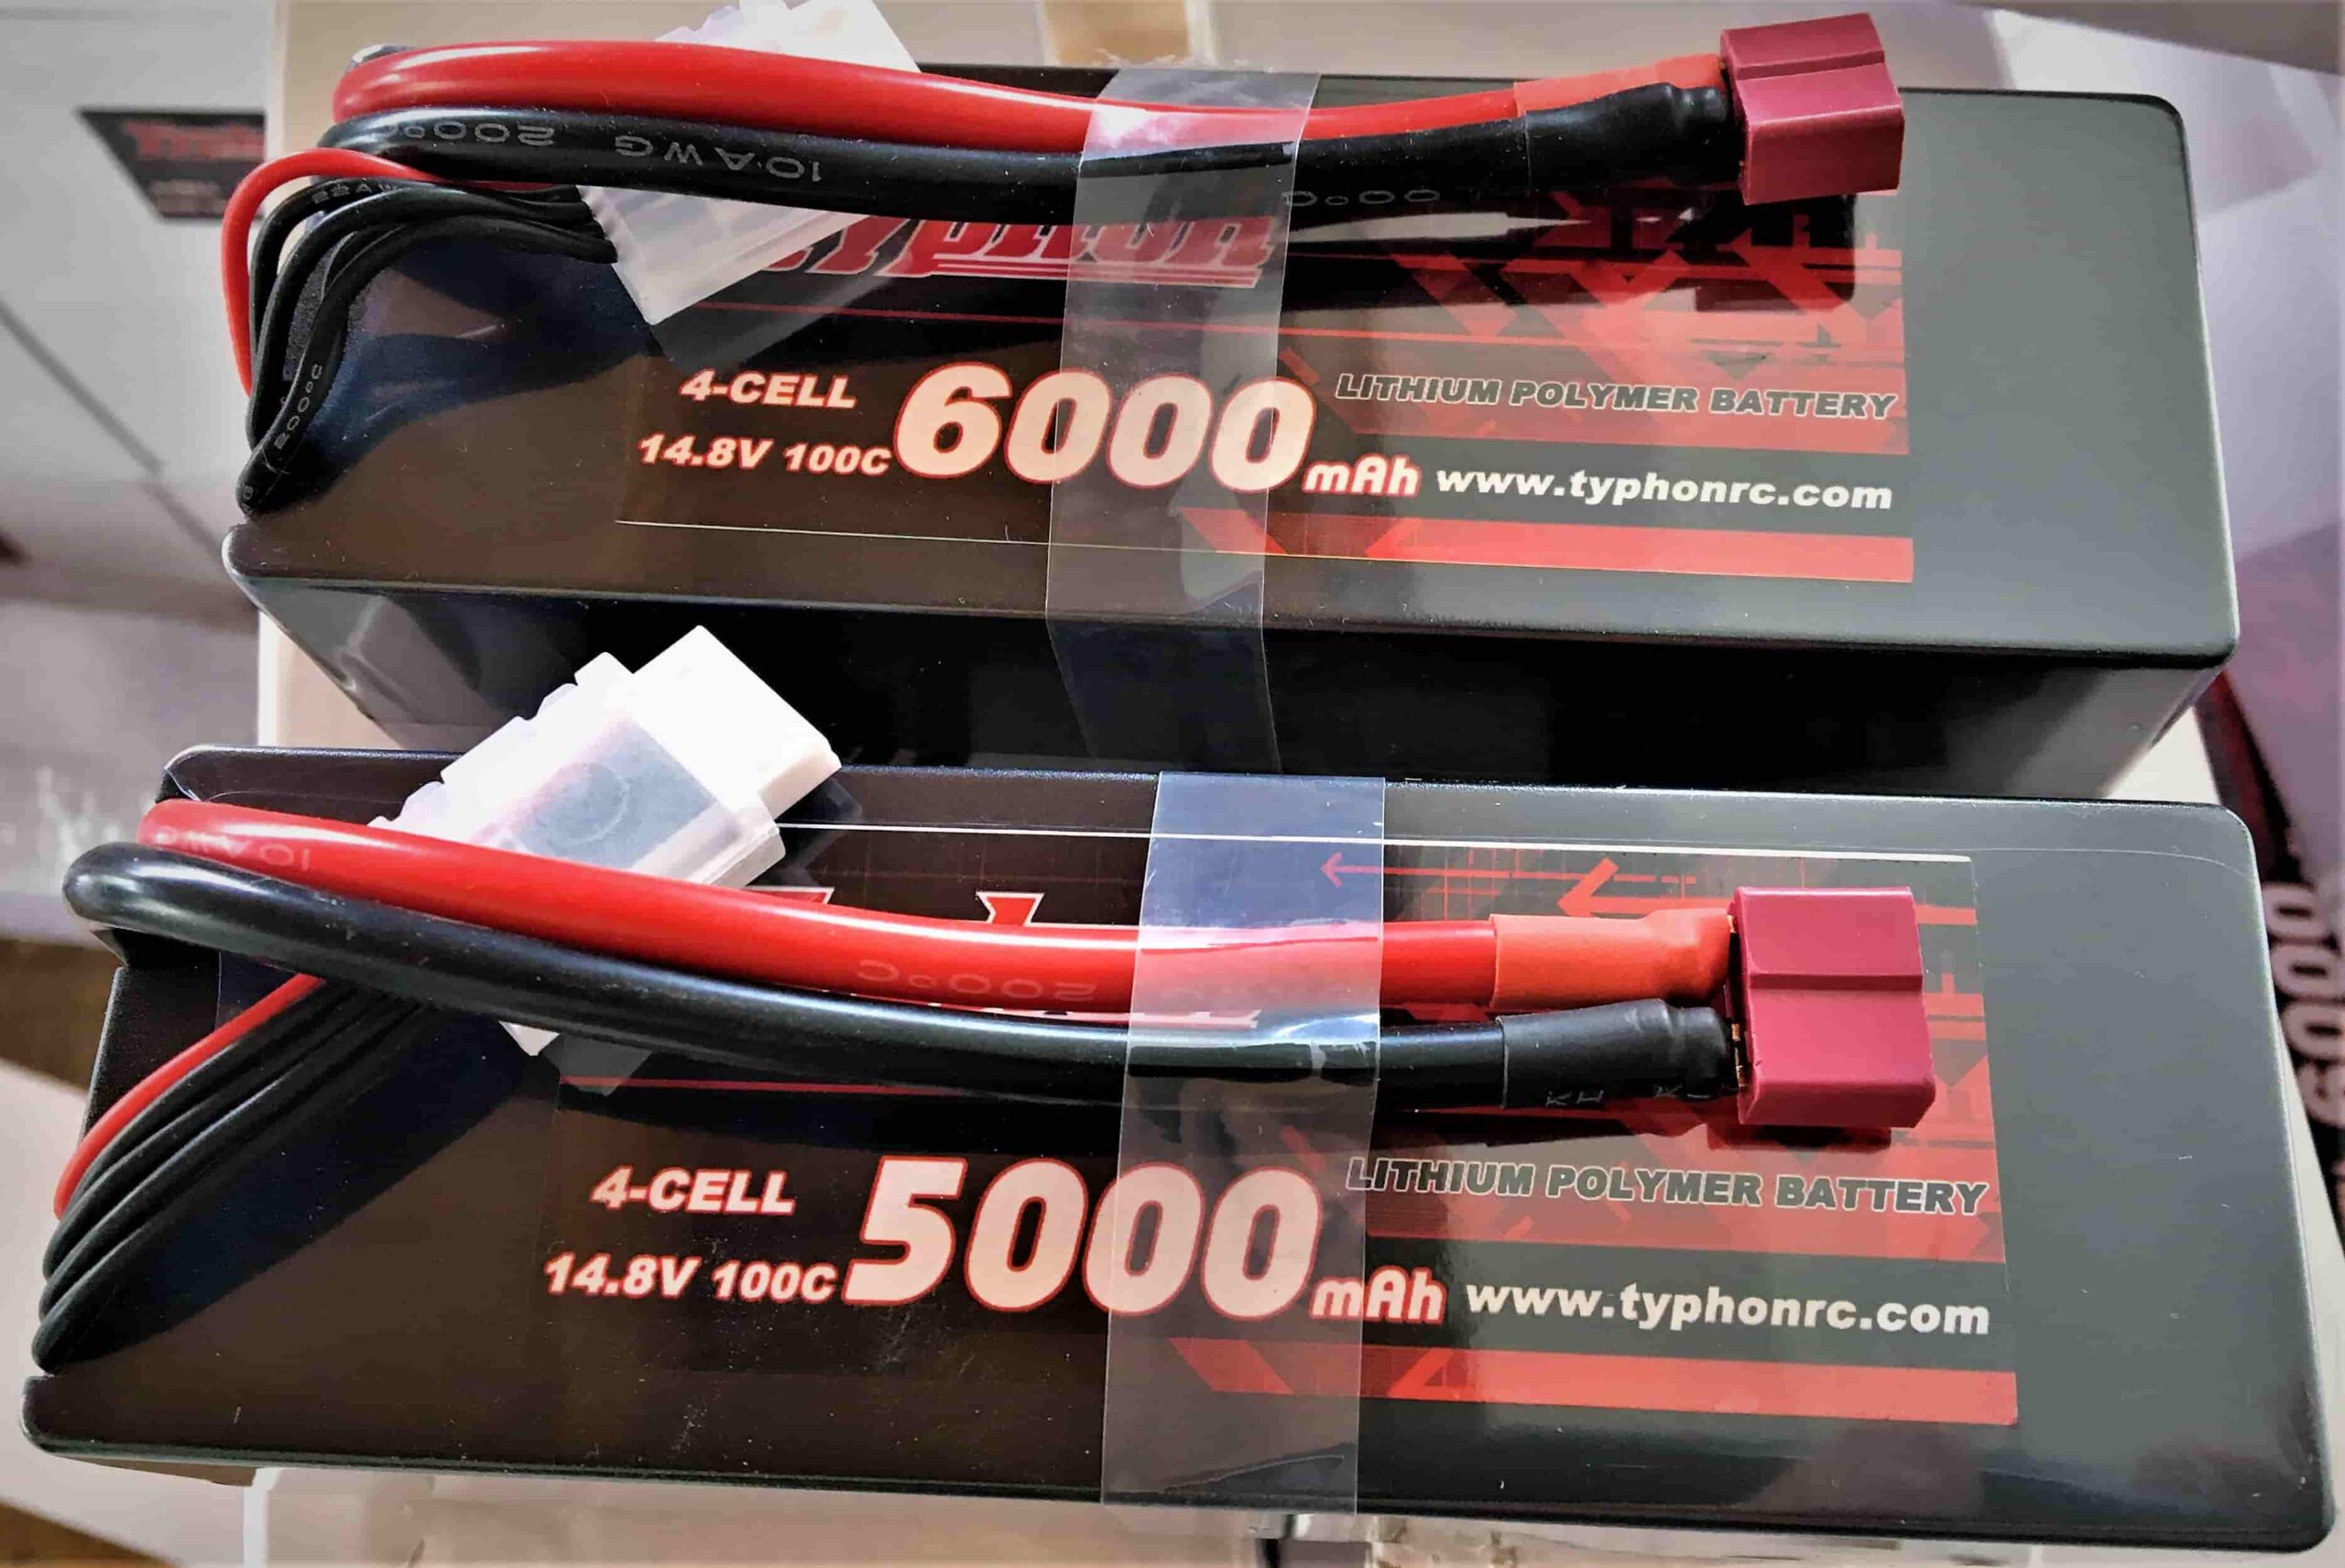 Batería Typhon 14,8 5000 MAH